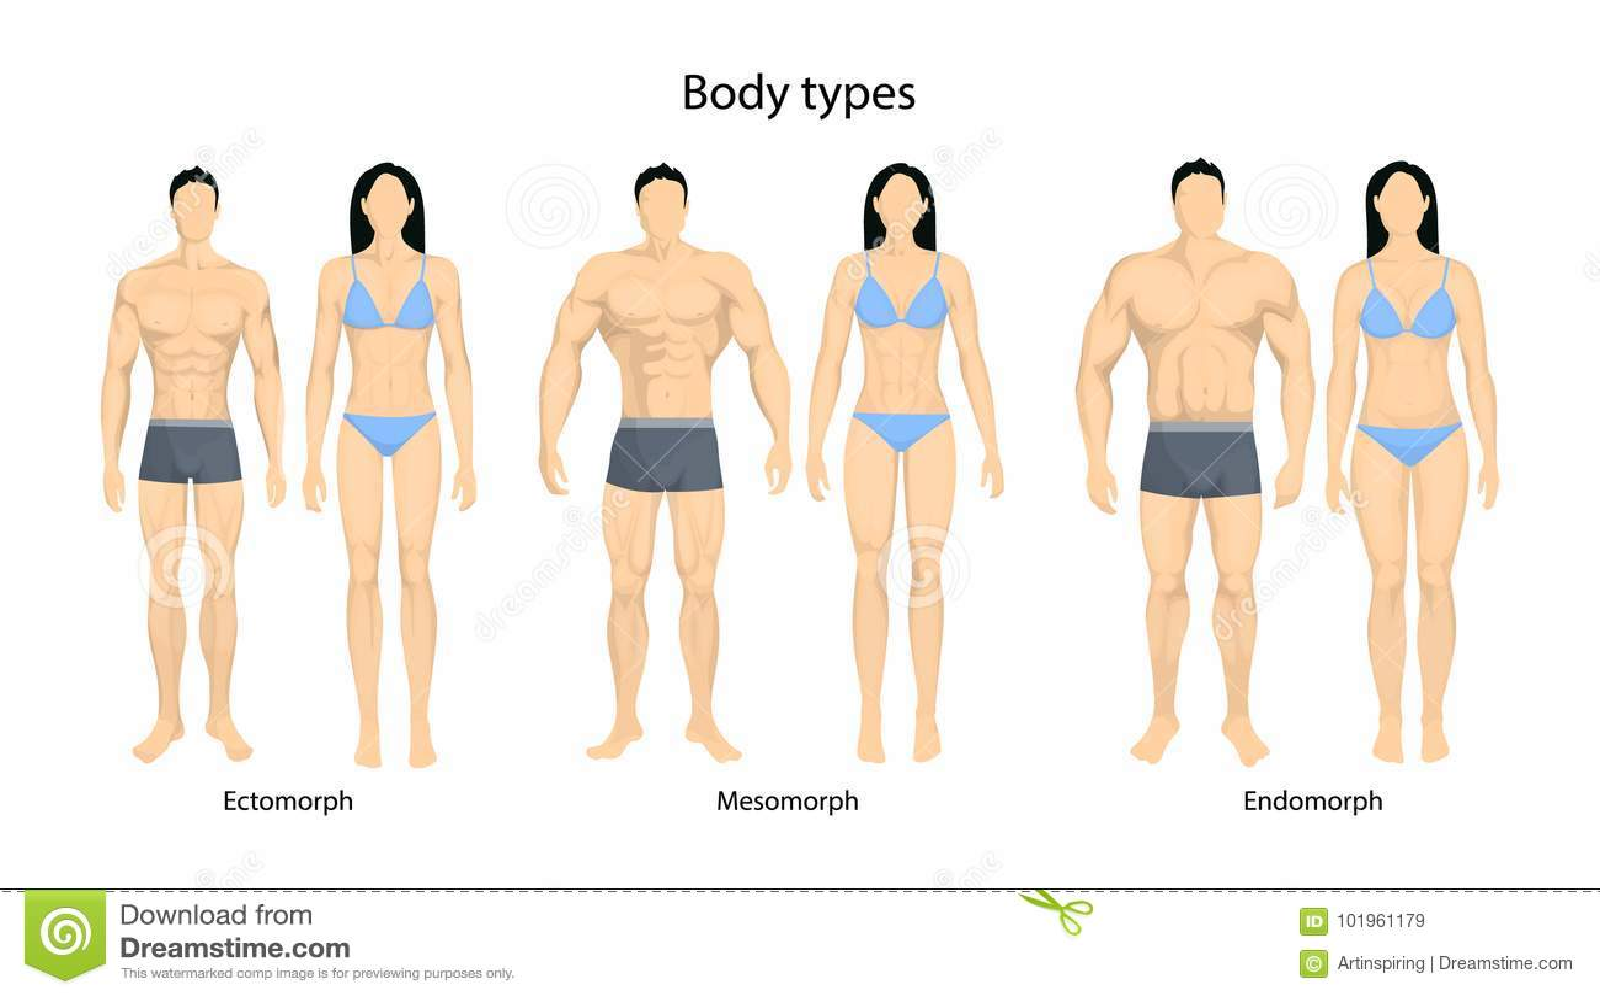 body types men - Isken kaptanband co